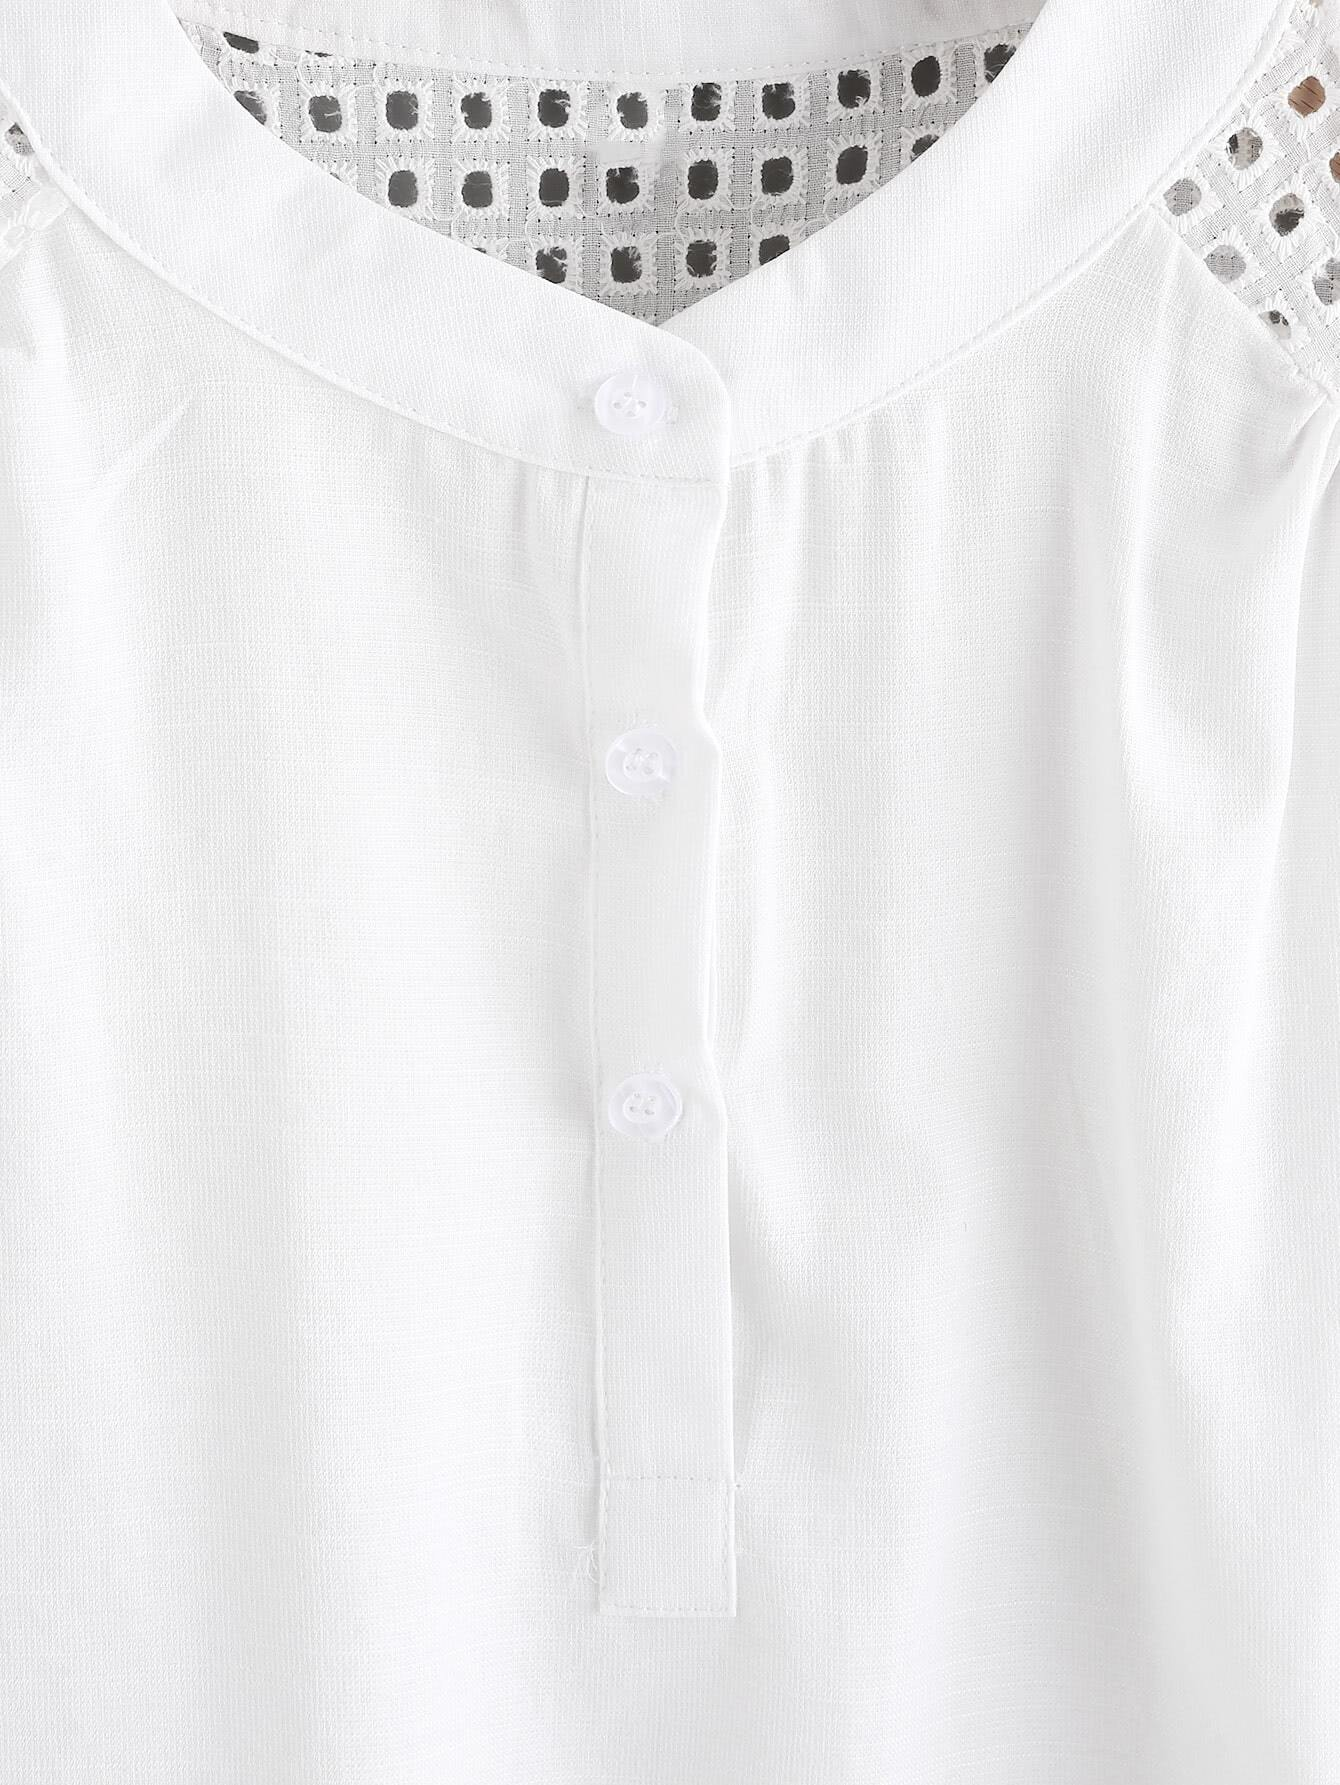 blouse170522102_2